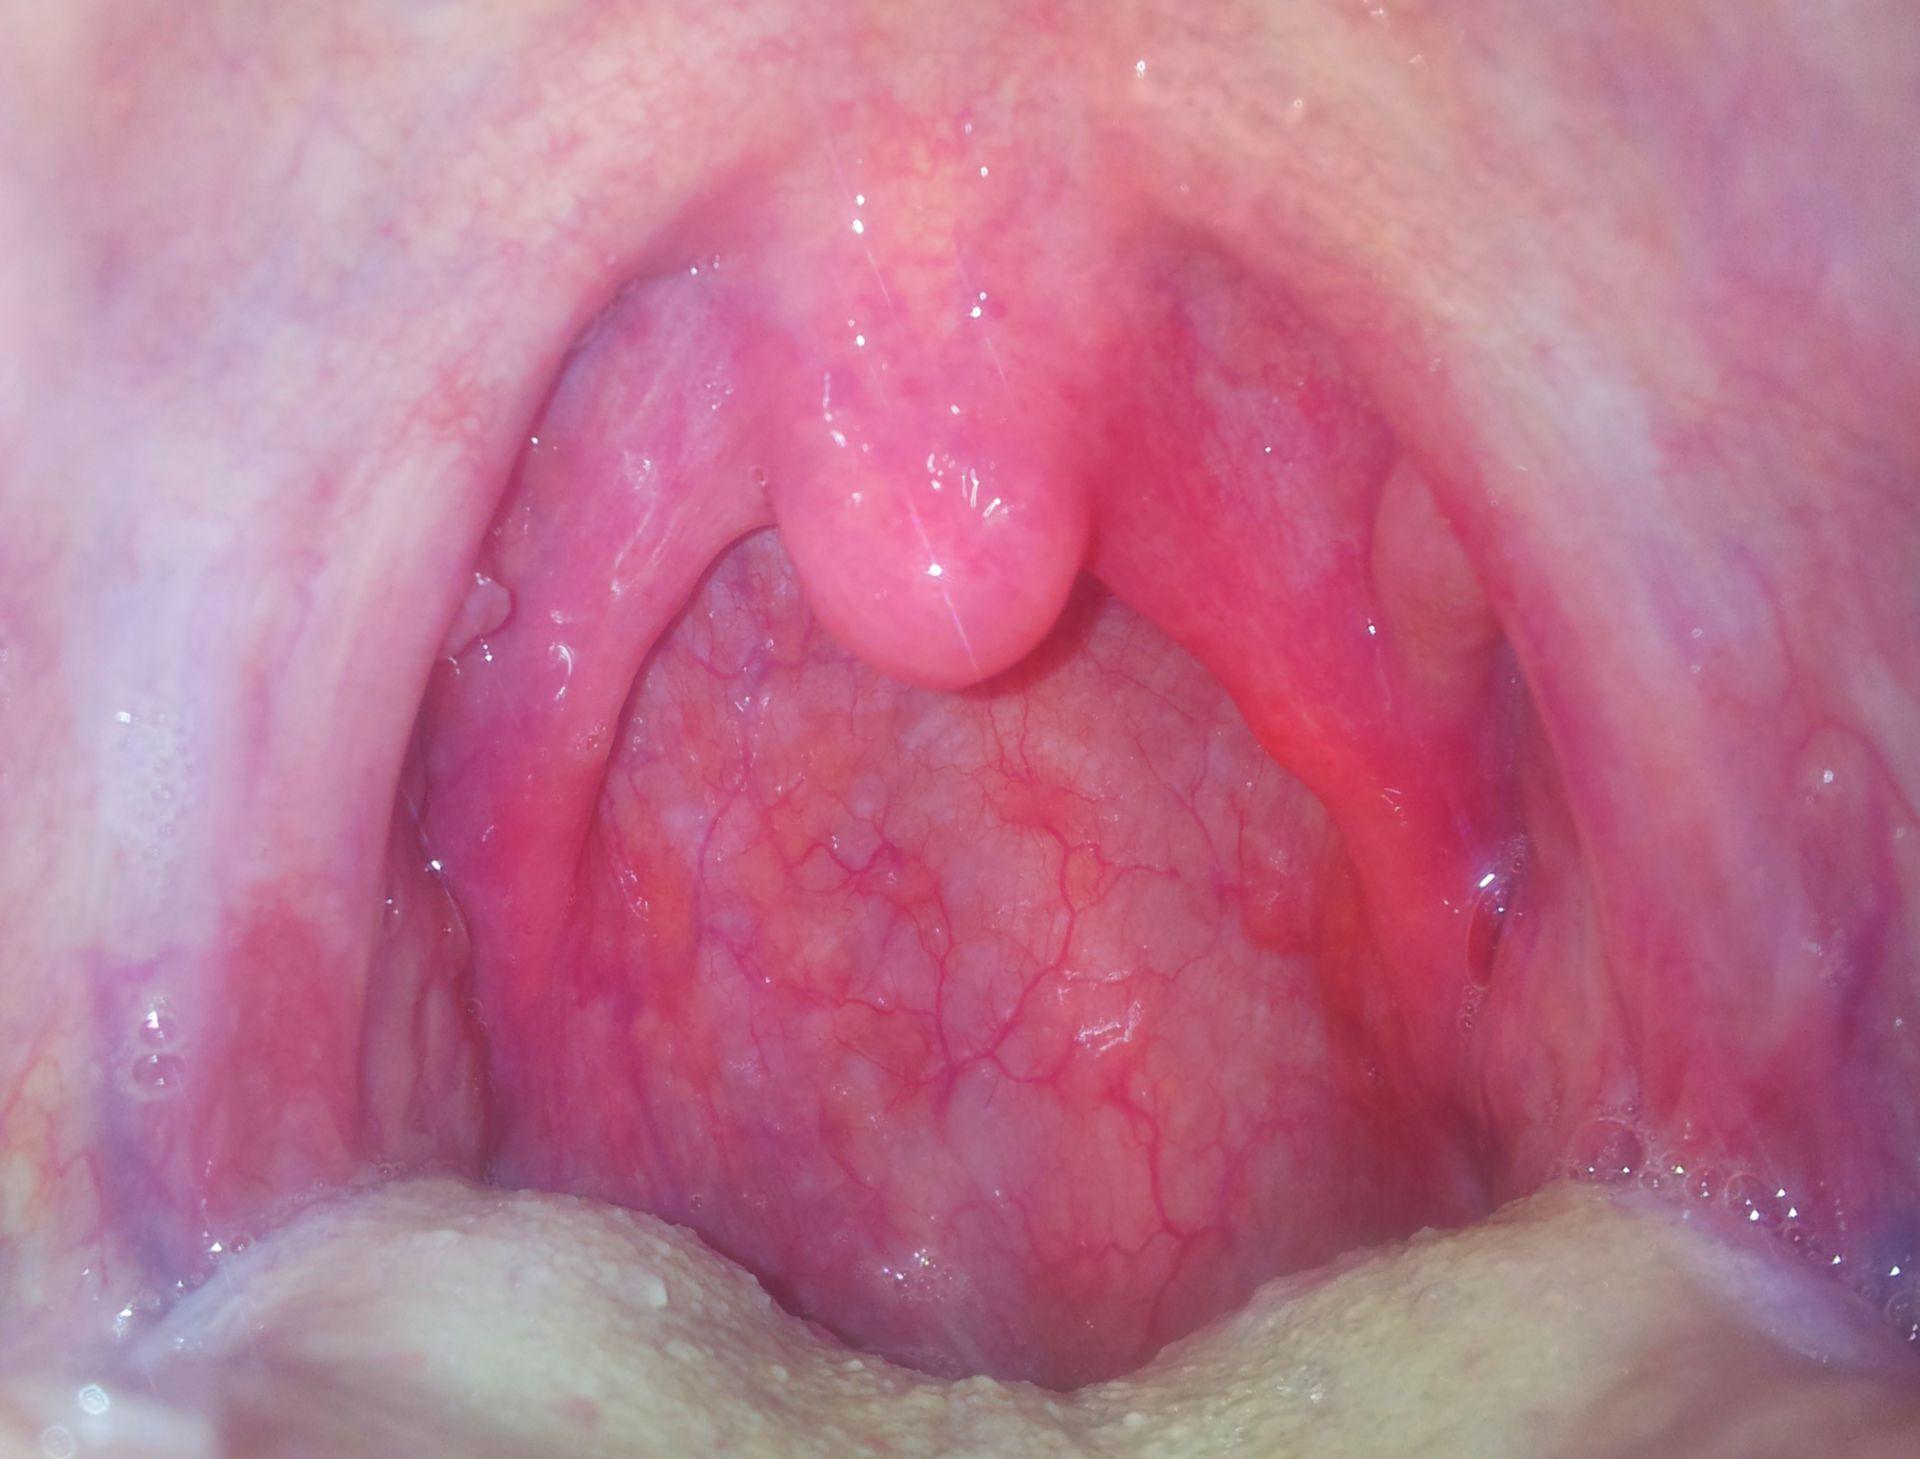 Faringitis unilateral